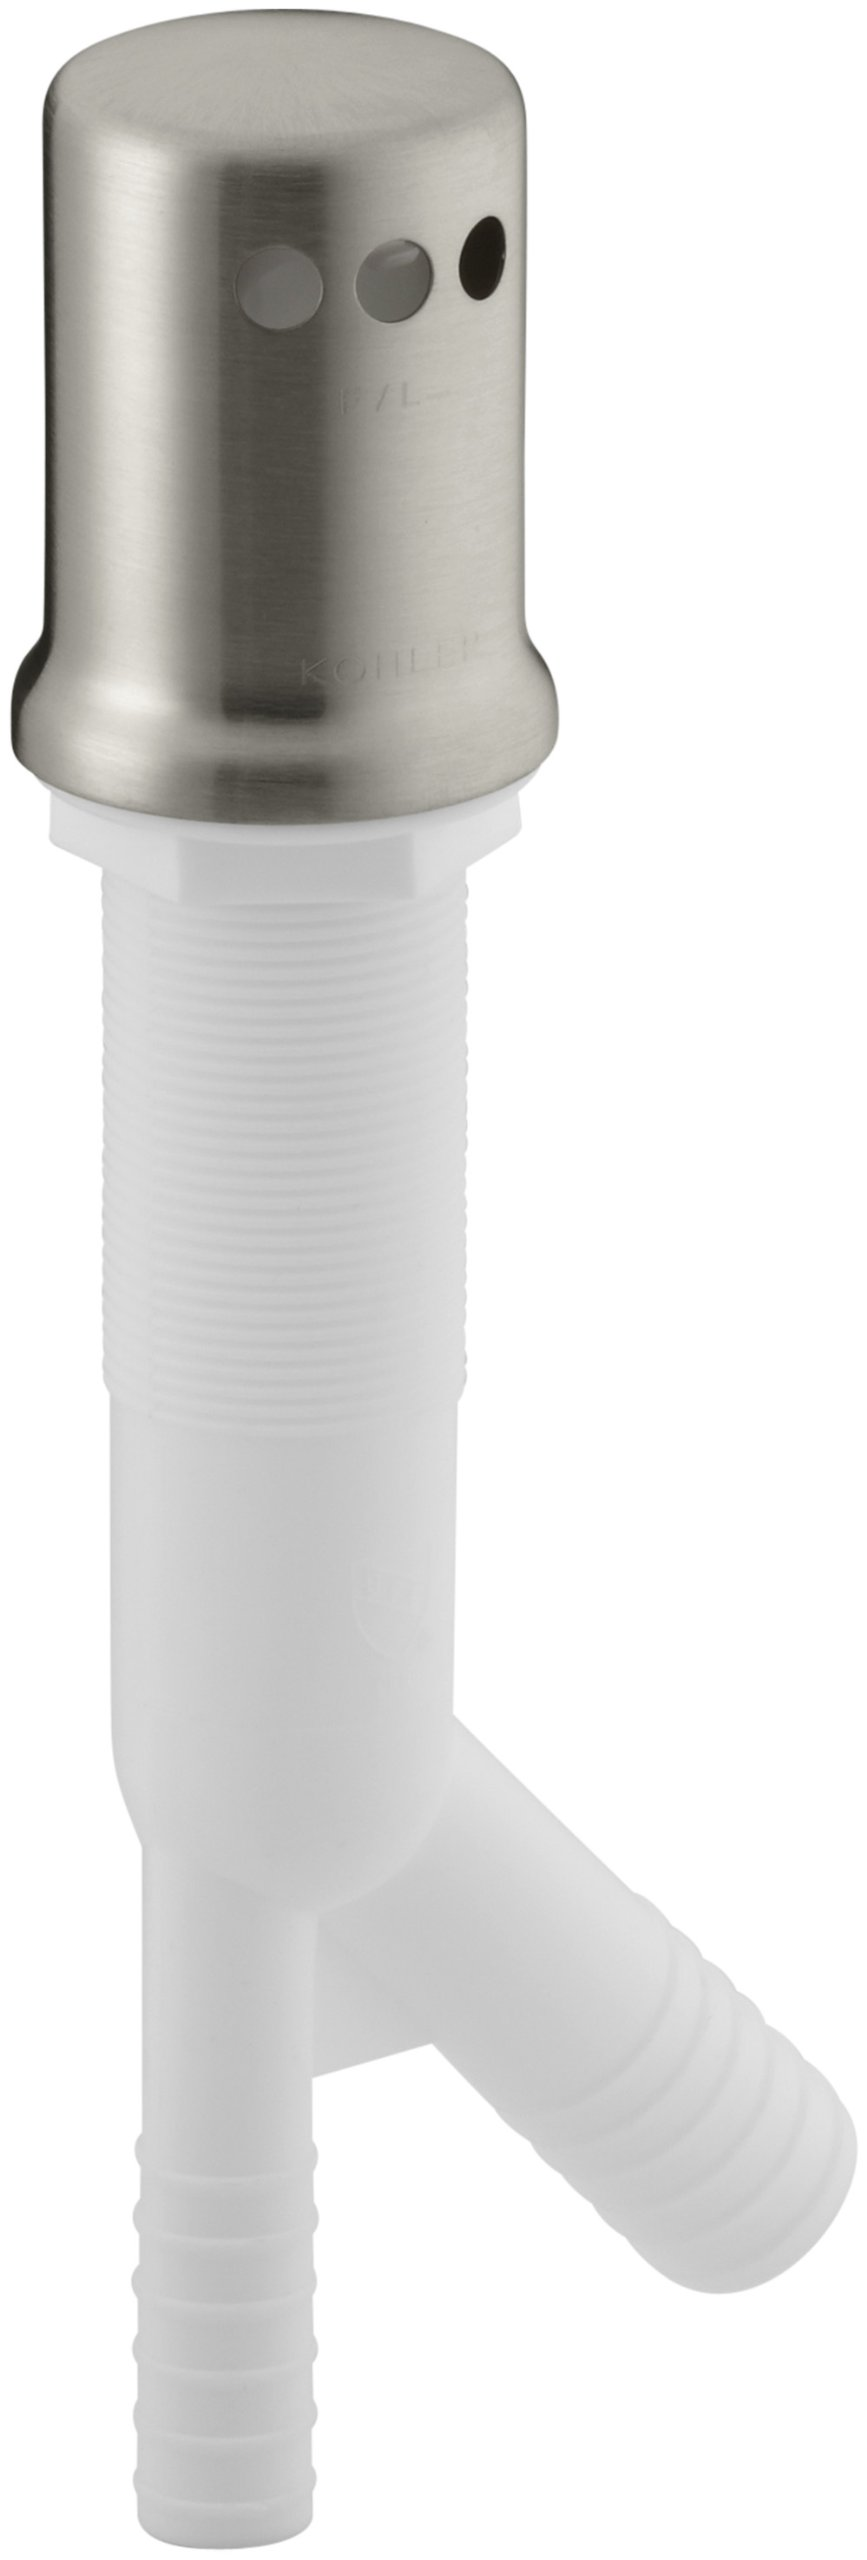 KOHLER K-9110-BN Air Gap Body with Cover, Vibrant Brushed Nickel